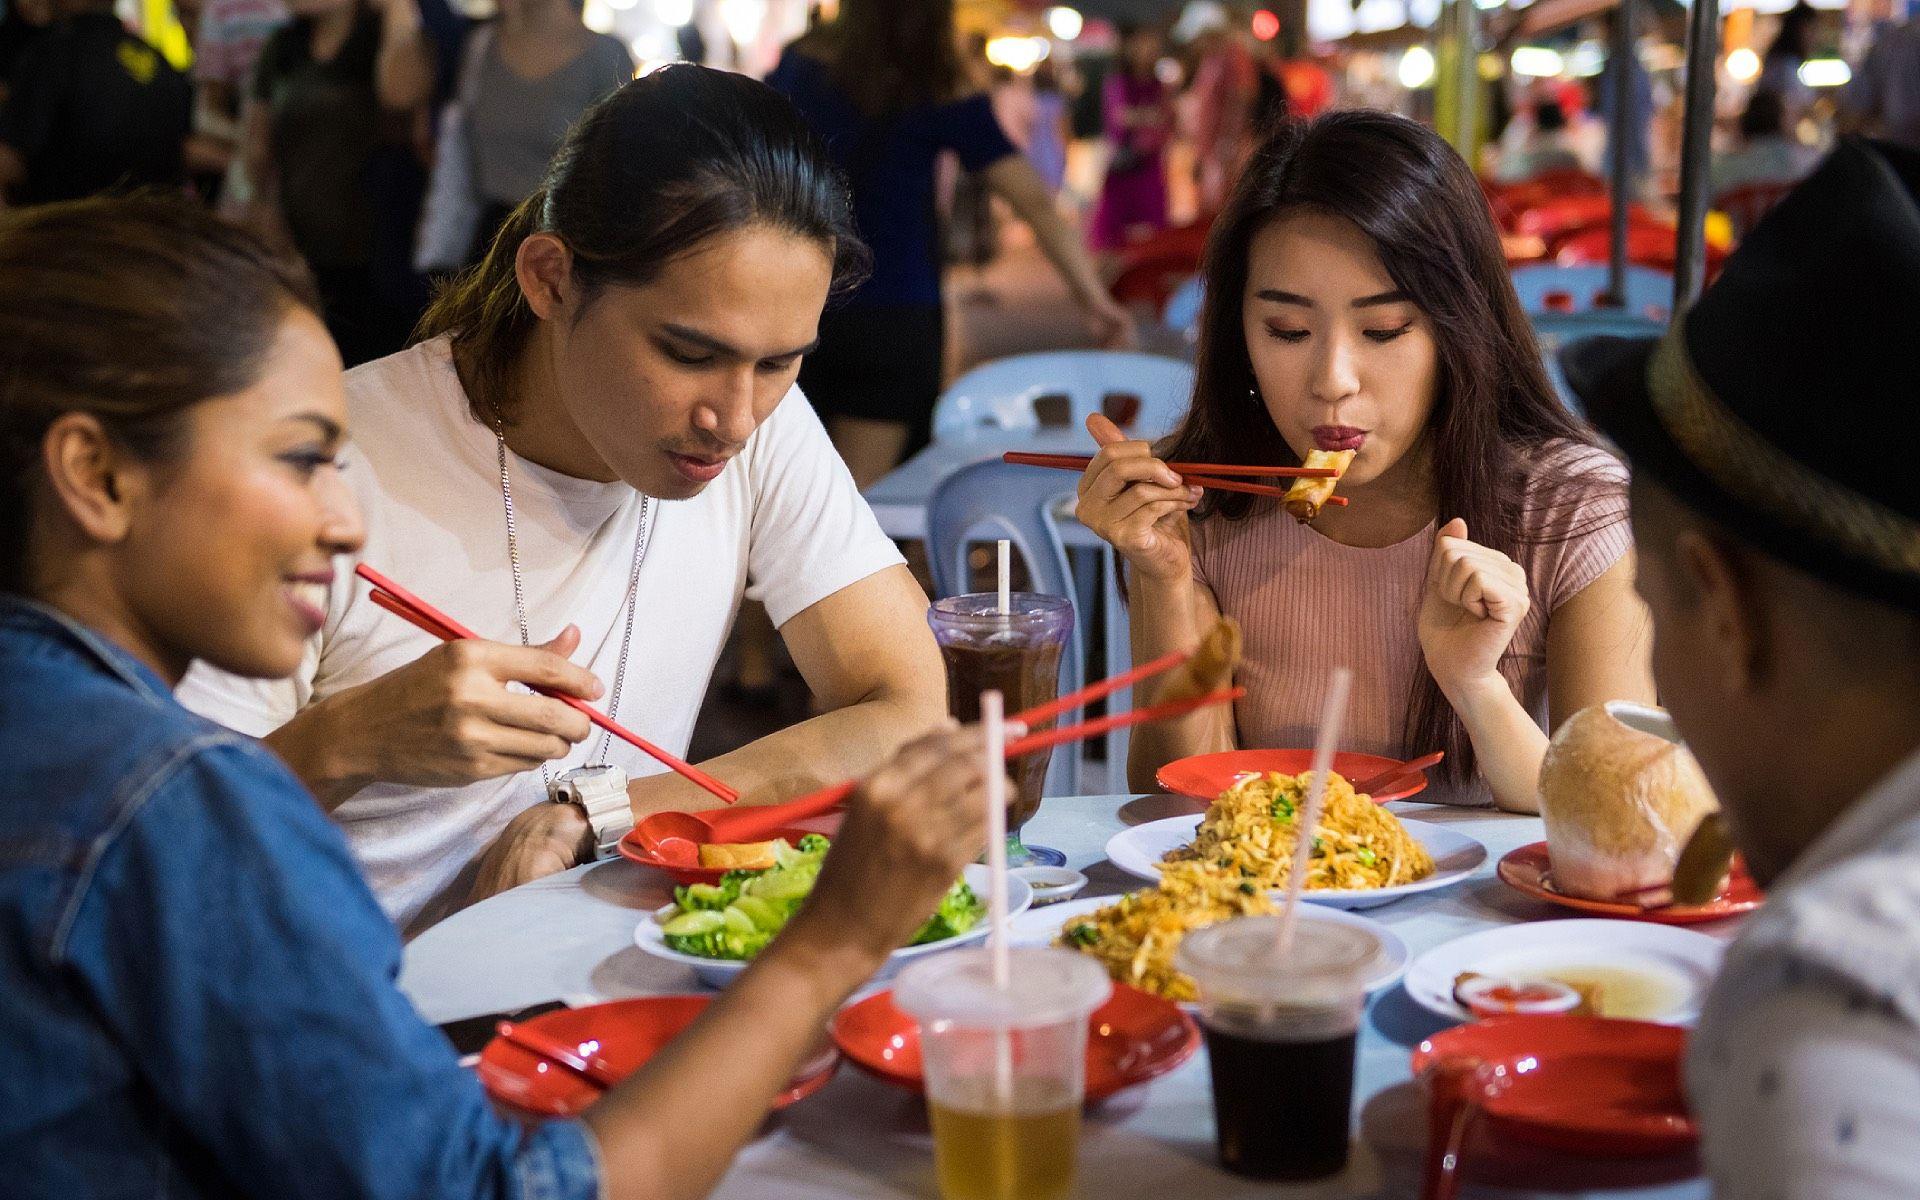 Friends tucking into street eats at Jalan Alor, Kuala Lumpur (Photo: iStock)